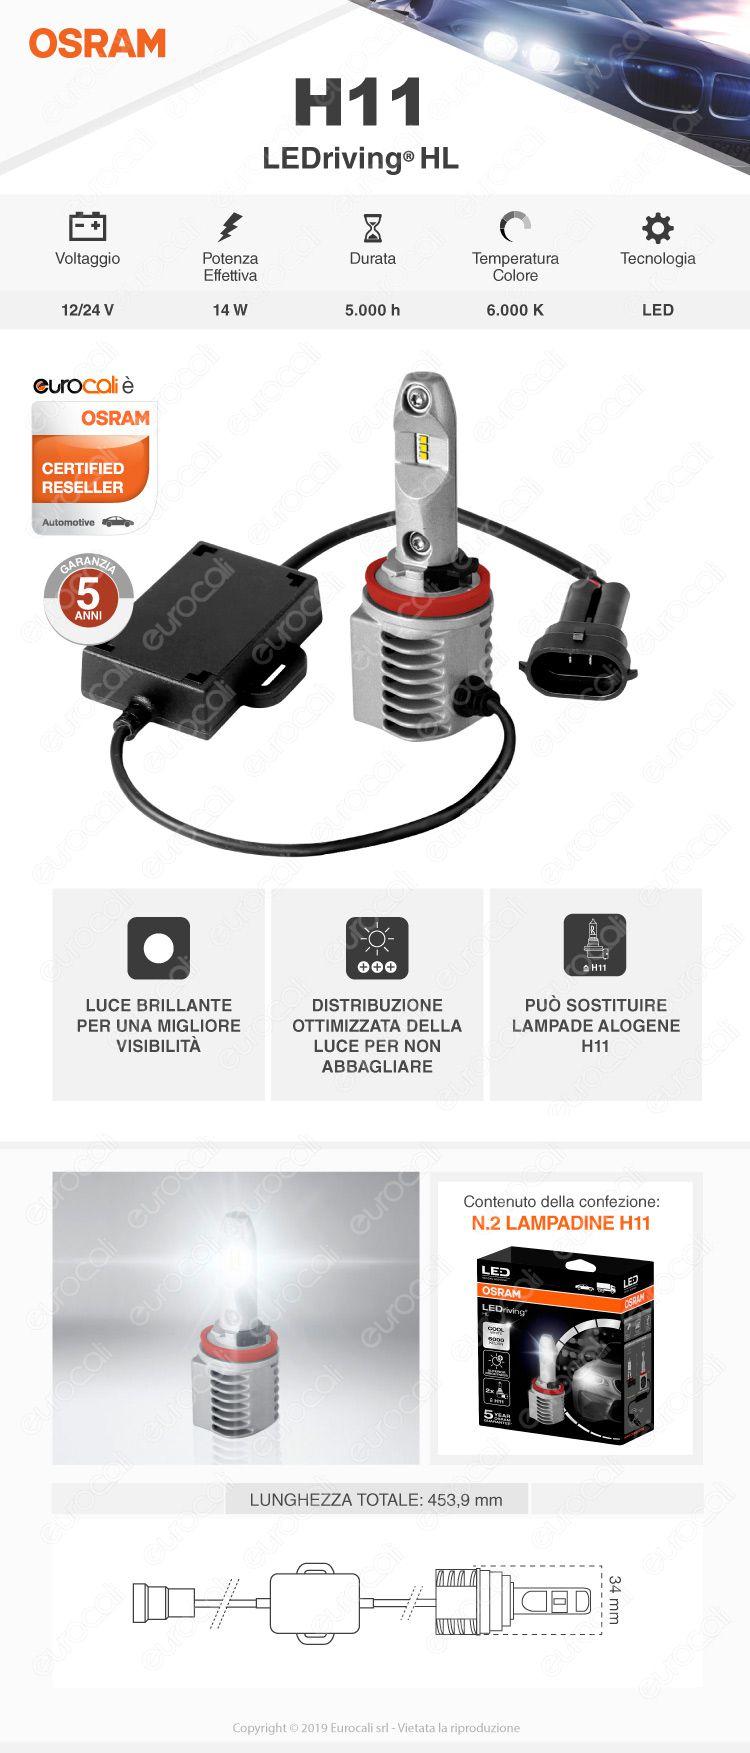 2 Lampadine H11 Osram LEDriving HL